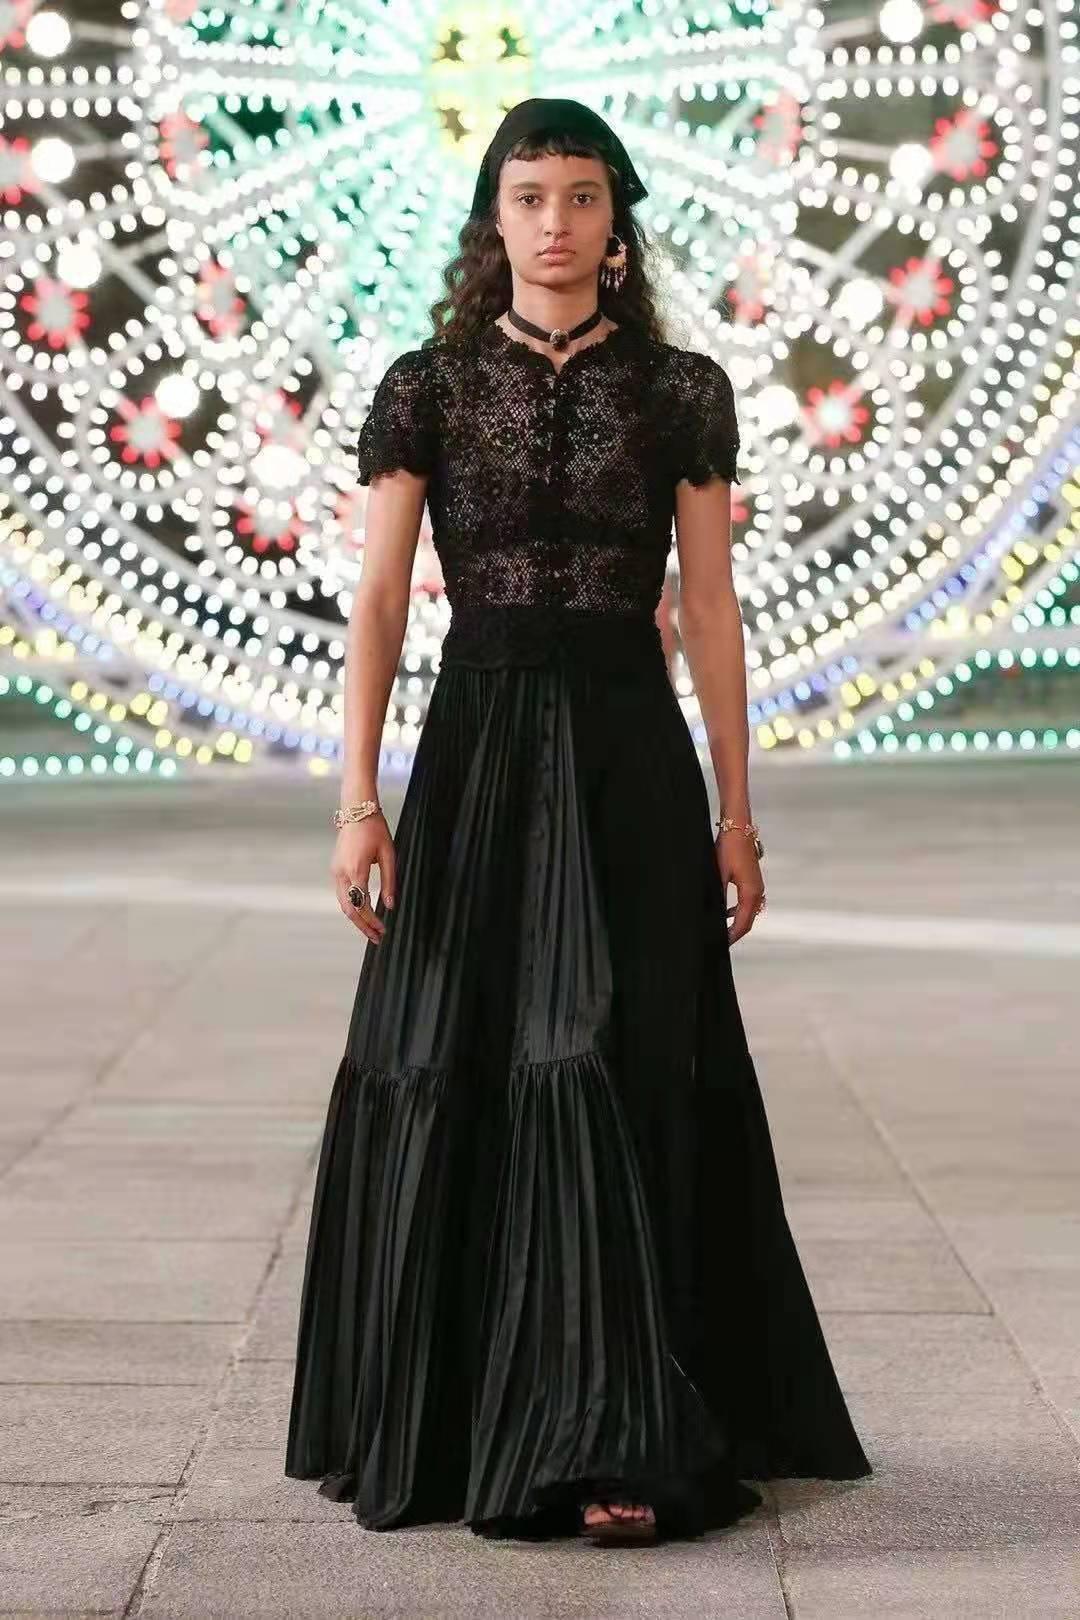 Prom Dresses Summer Dress 2021 Evening Lace Cotton Party Vintage Long Dress V Neck Short Sleeve Black White Women Clothing Molin 6